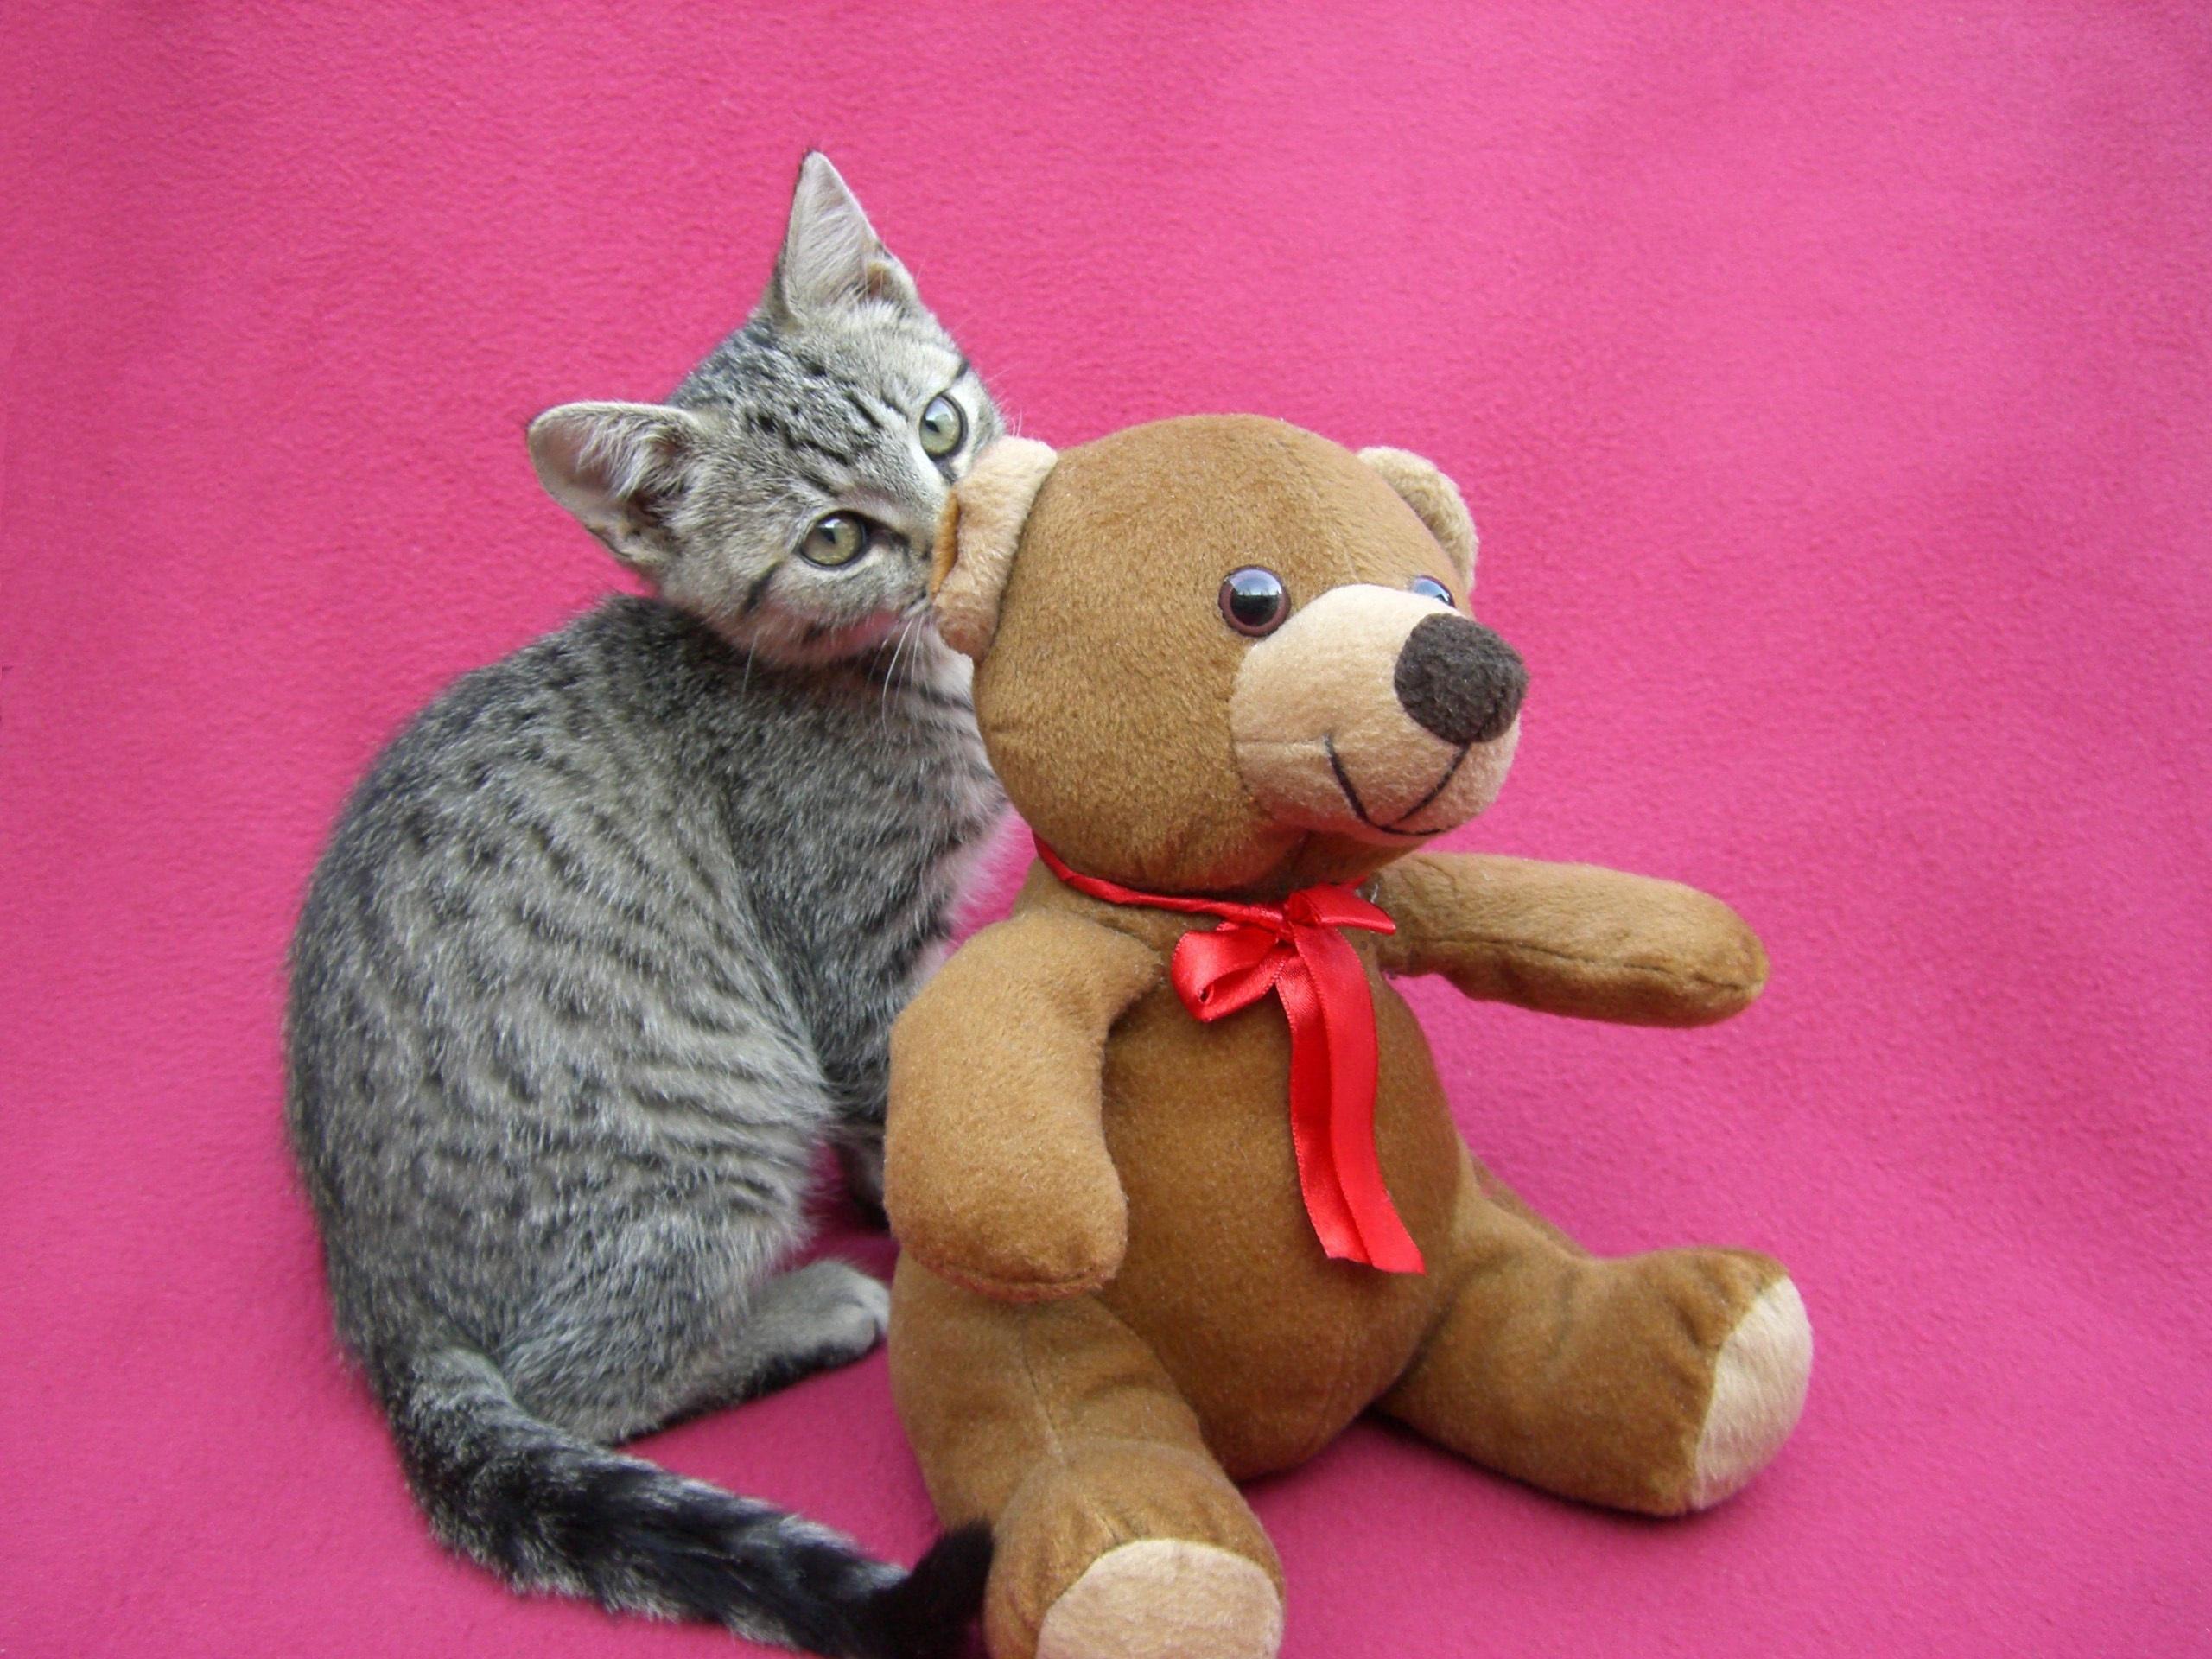 Kostenlose foto : süß, Suchen, Jung, Kätzchen, Katze, katzenartig ...